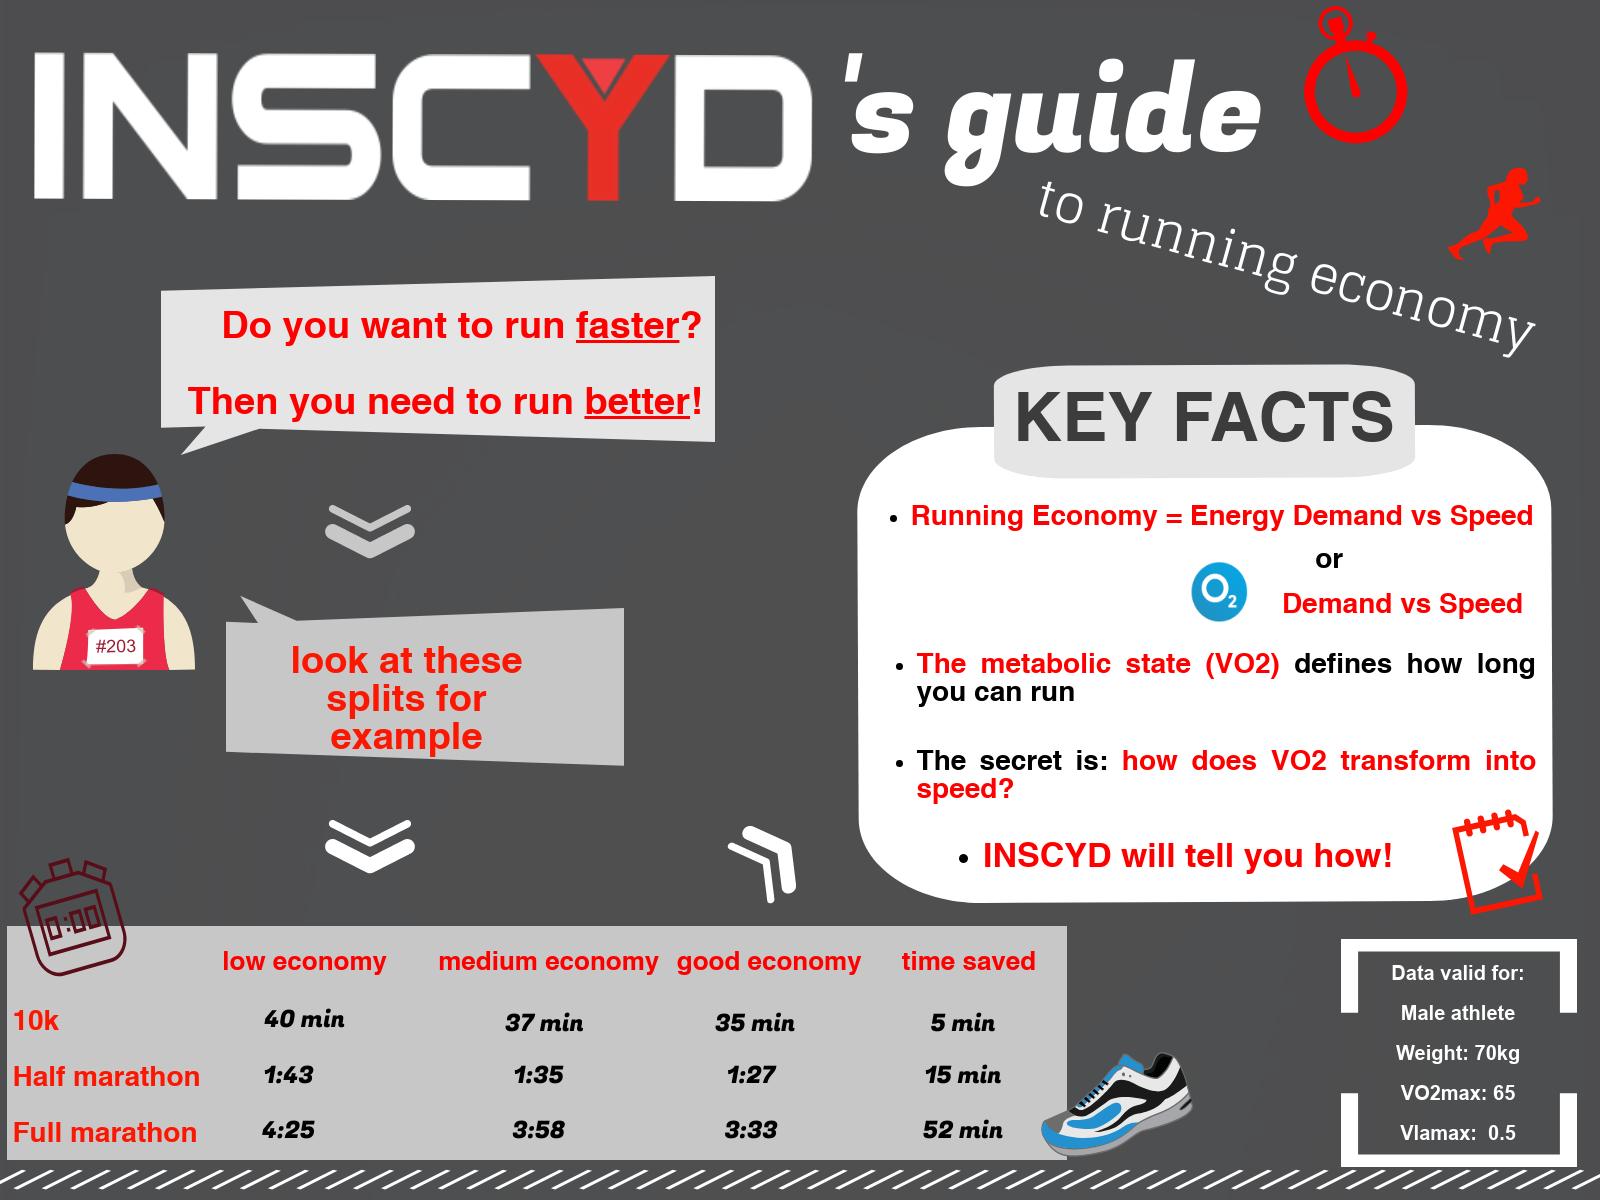 INSCYD's guide to running economy